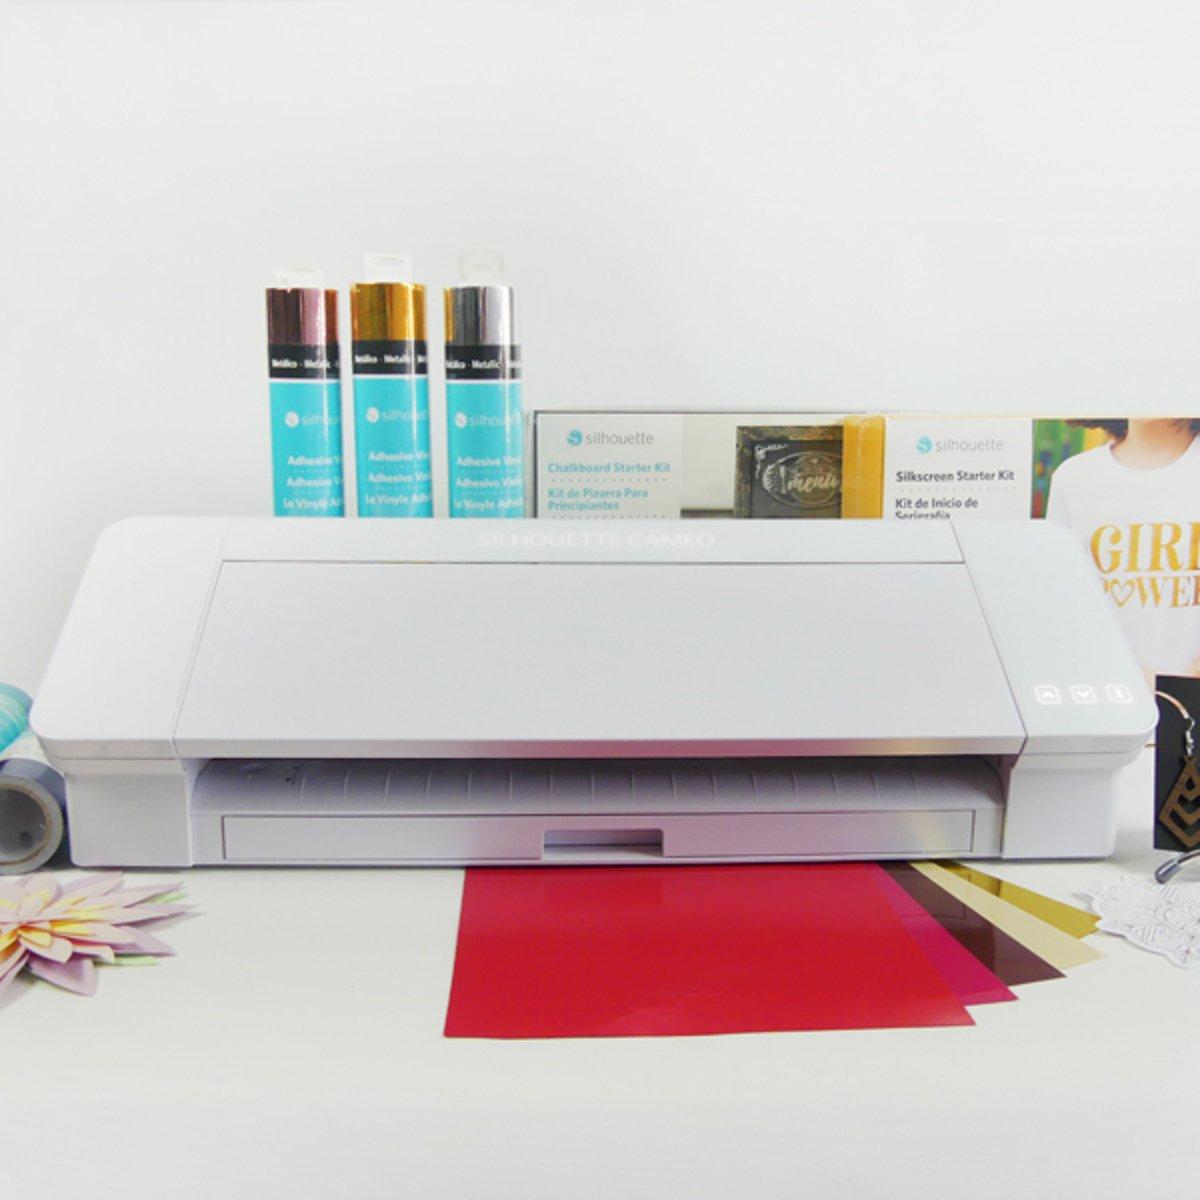 Silhouette Cameo 3 - full option edition - white kopen